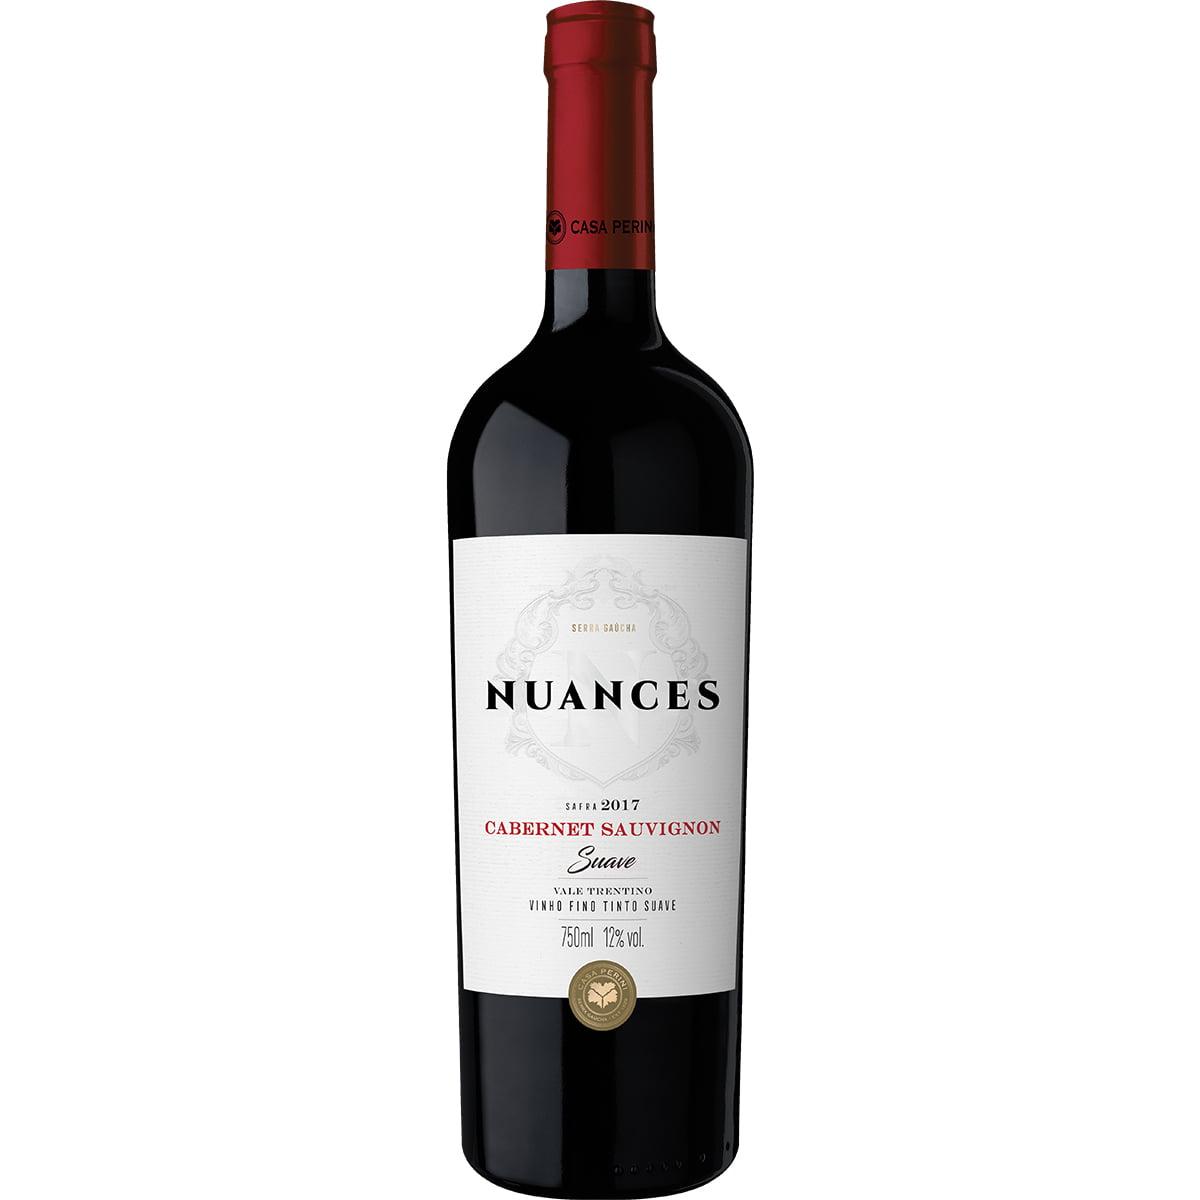 Vinho Casa Perini Nuances Cabernet Sauvignon Tinto Suave 750ml